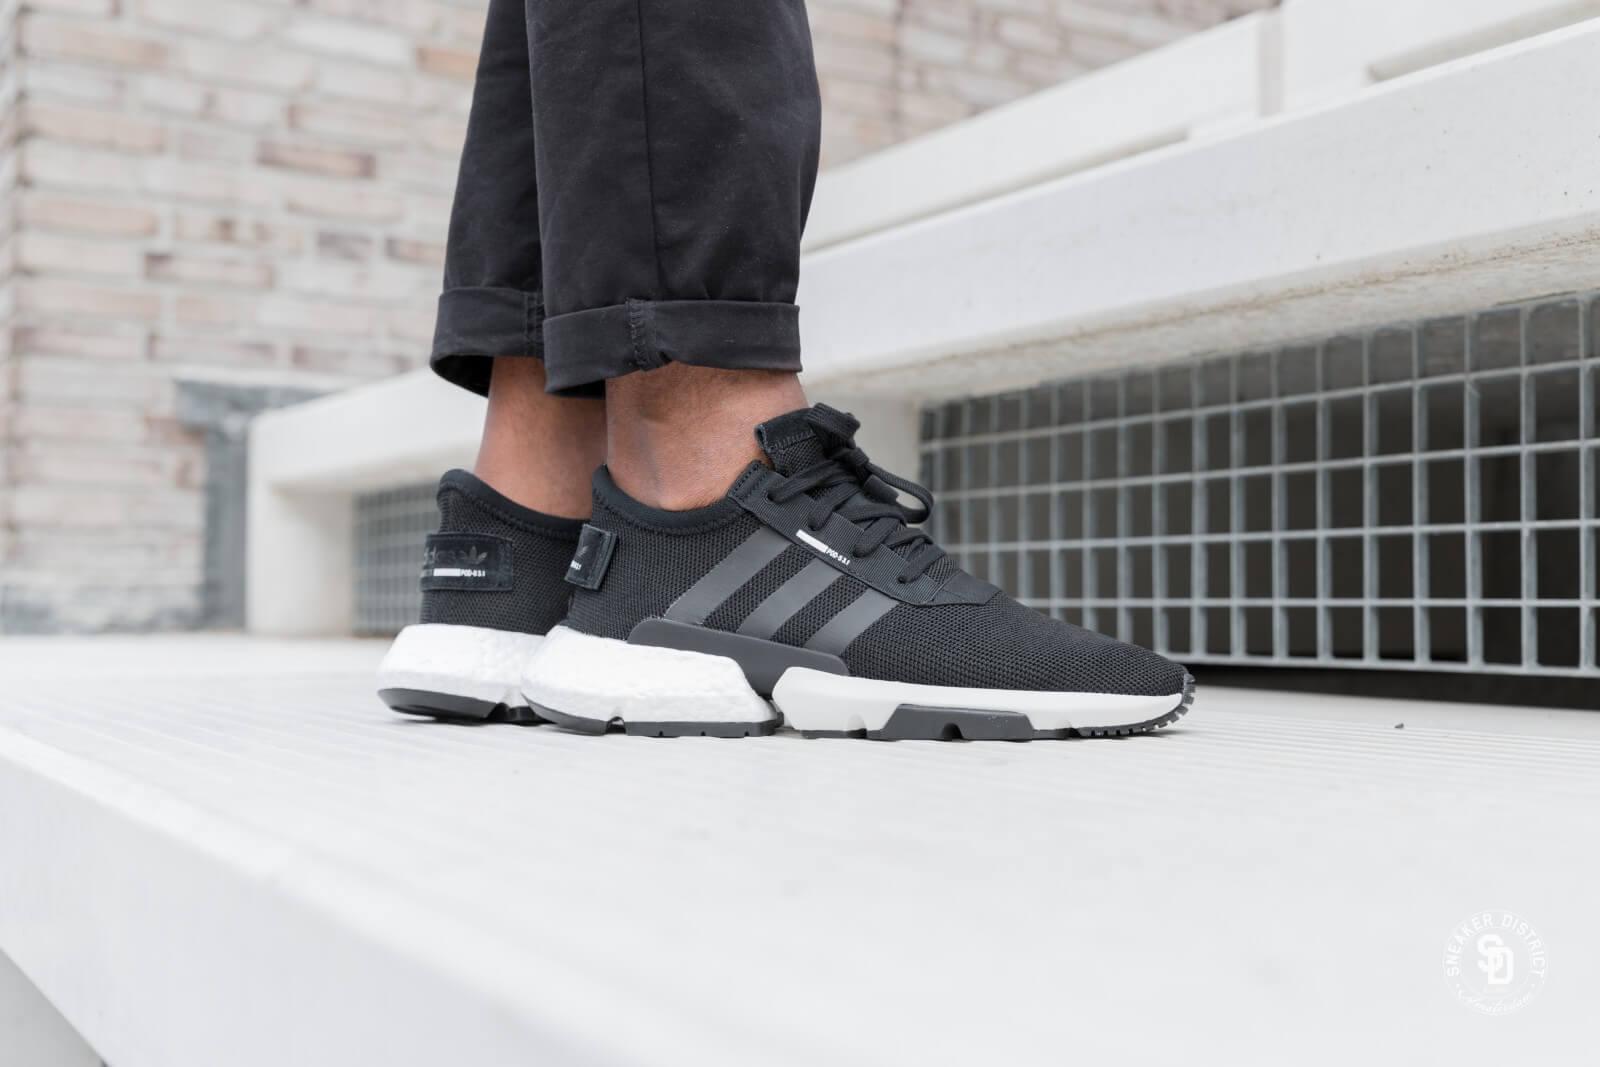 Adidas POD S3.1 Core BlackFootwear White B37366